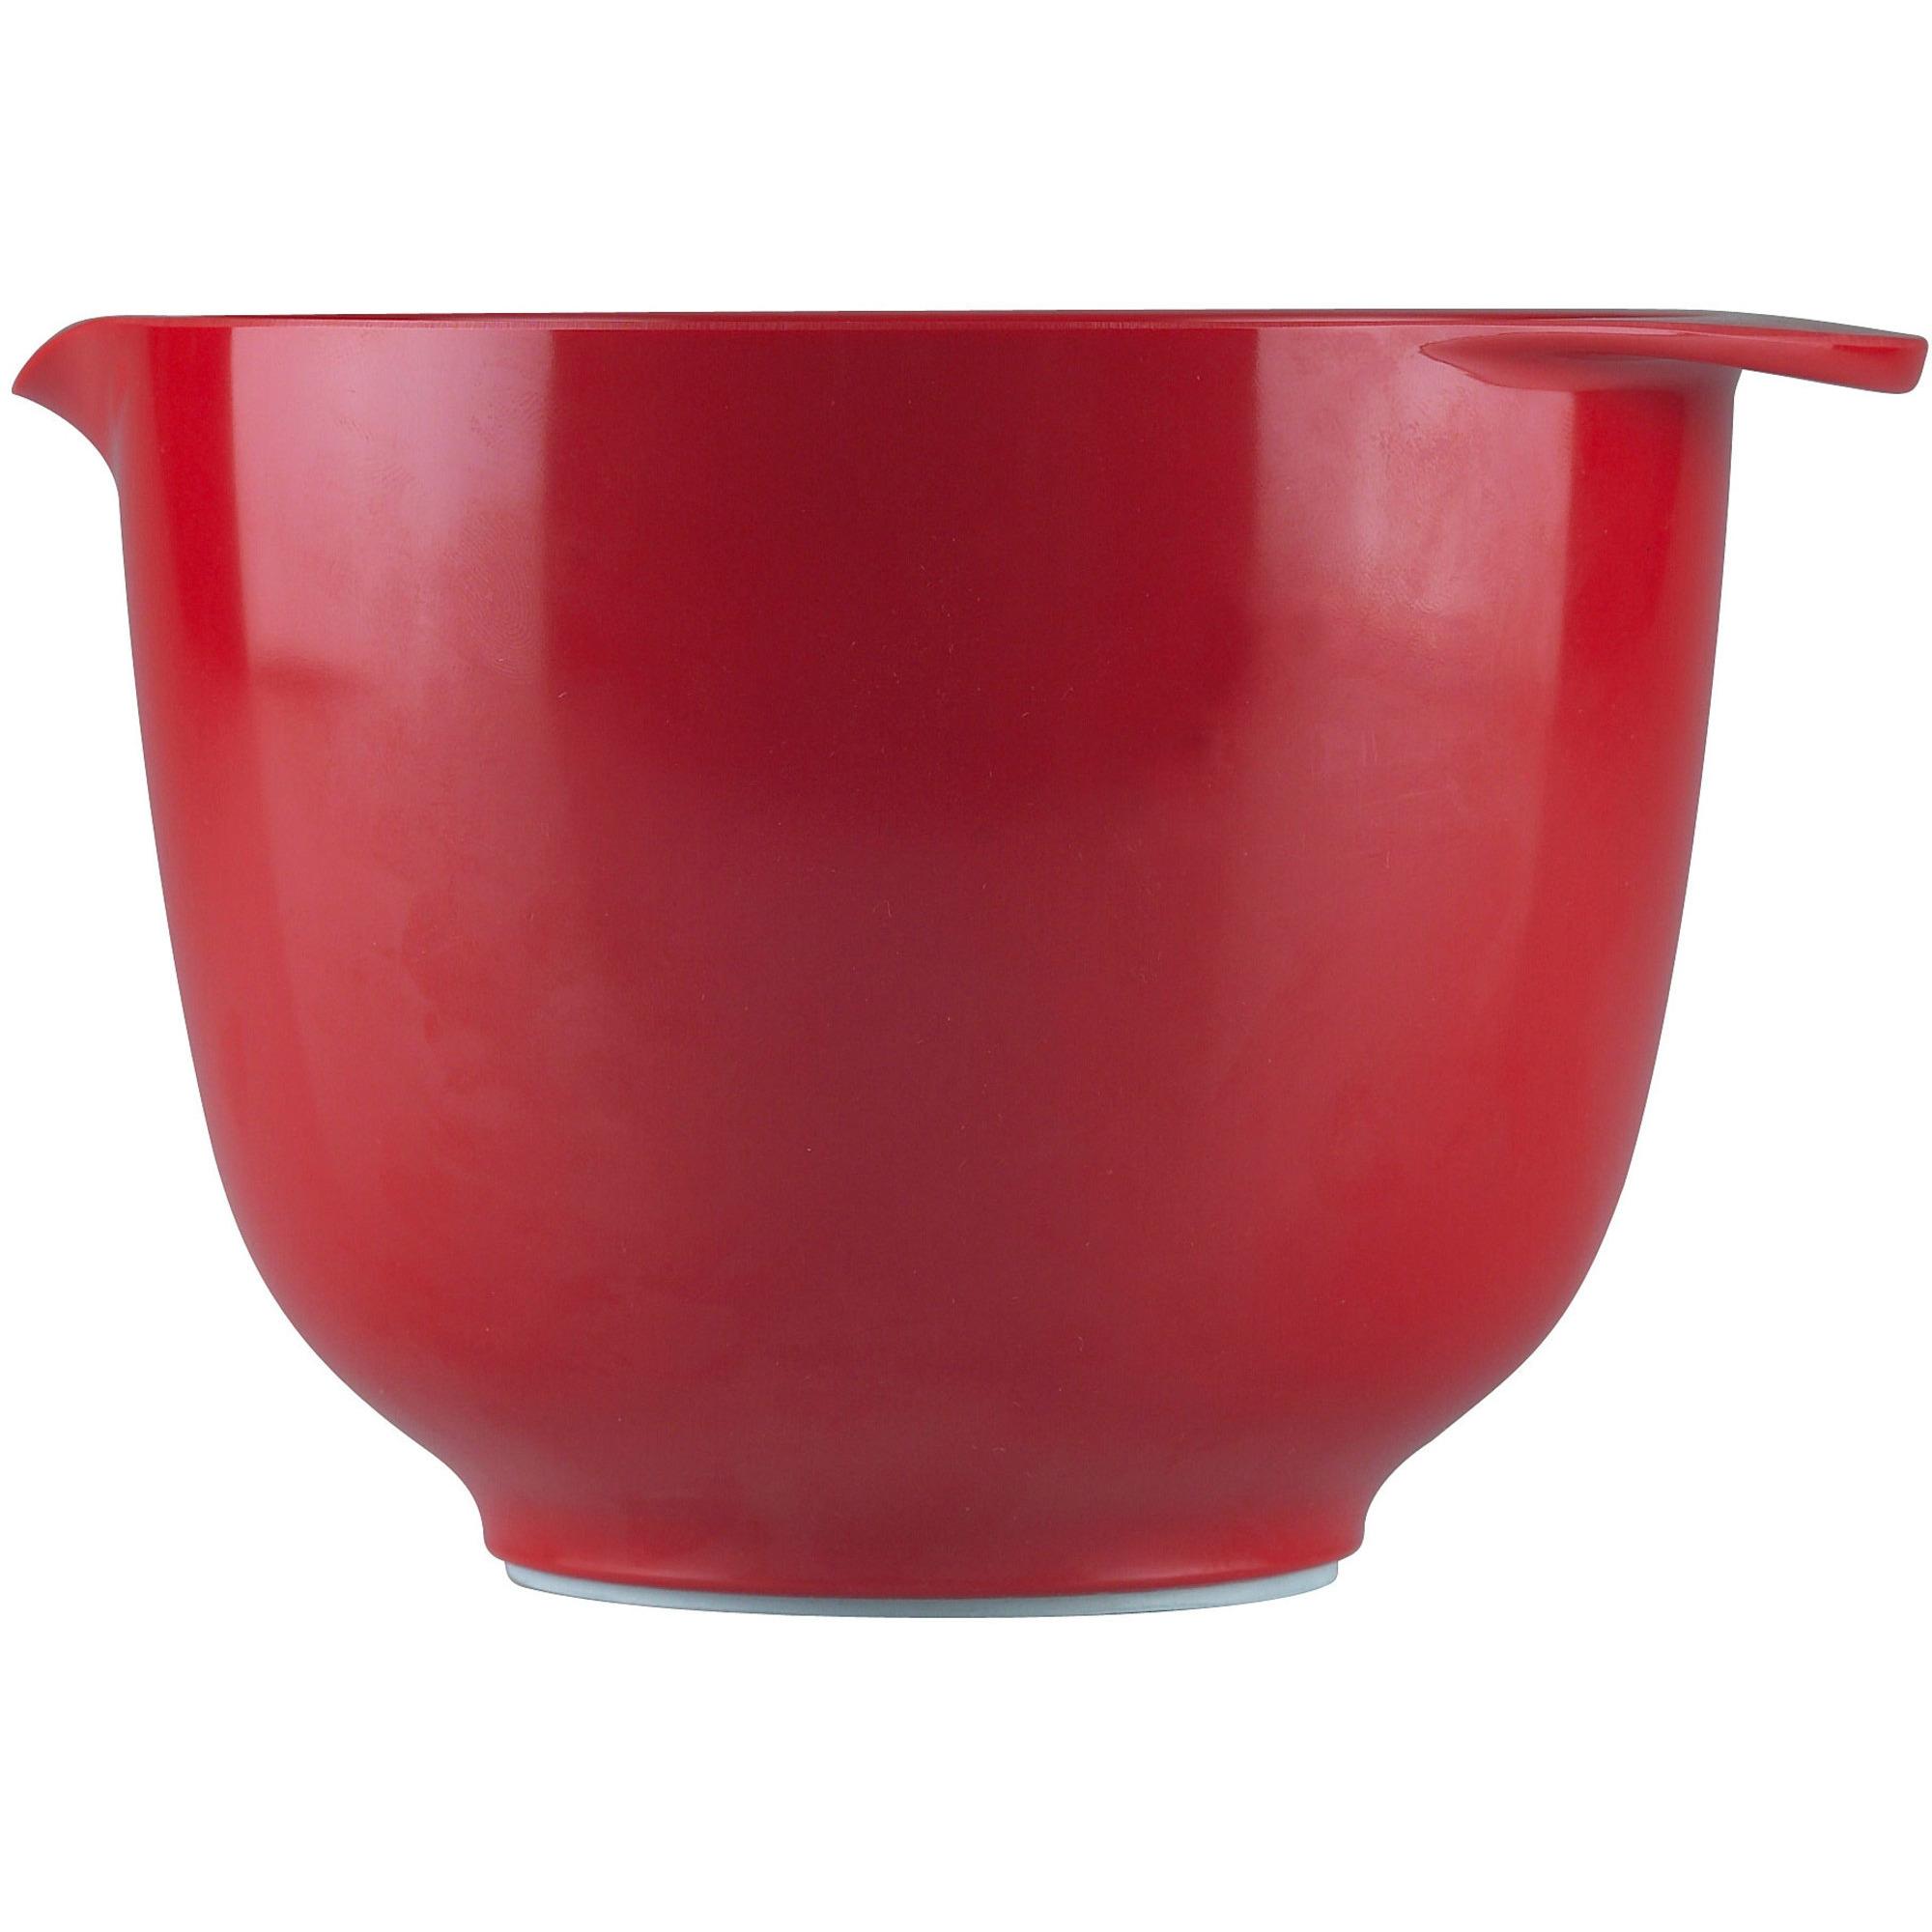 Rosti Mepal Skål Röd 15 liter